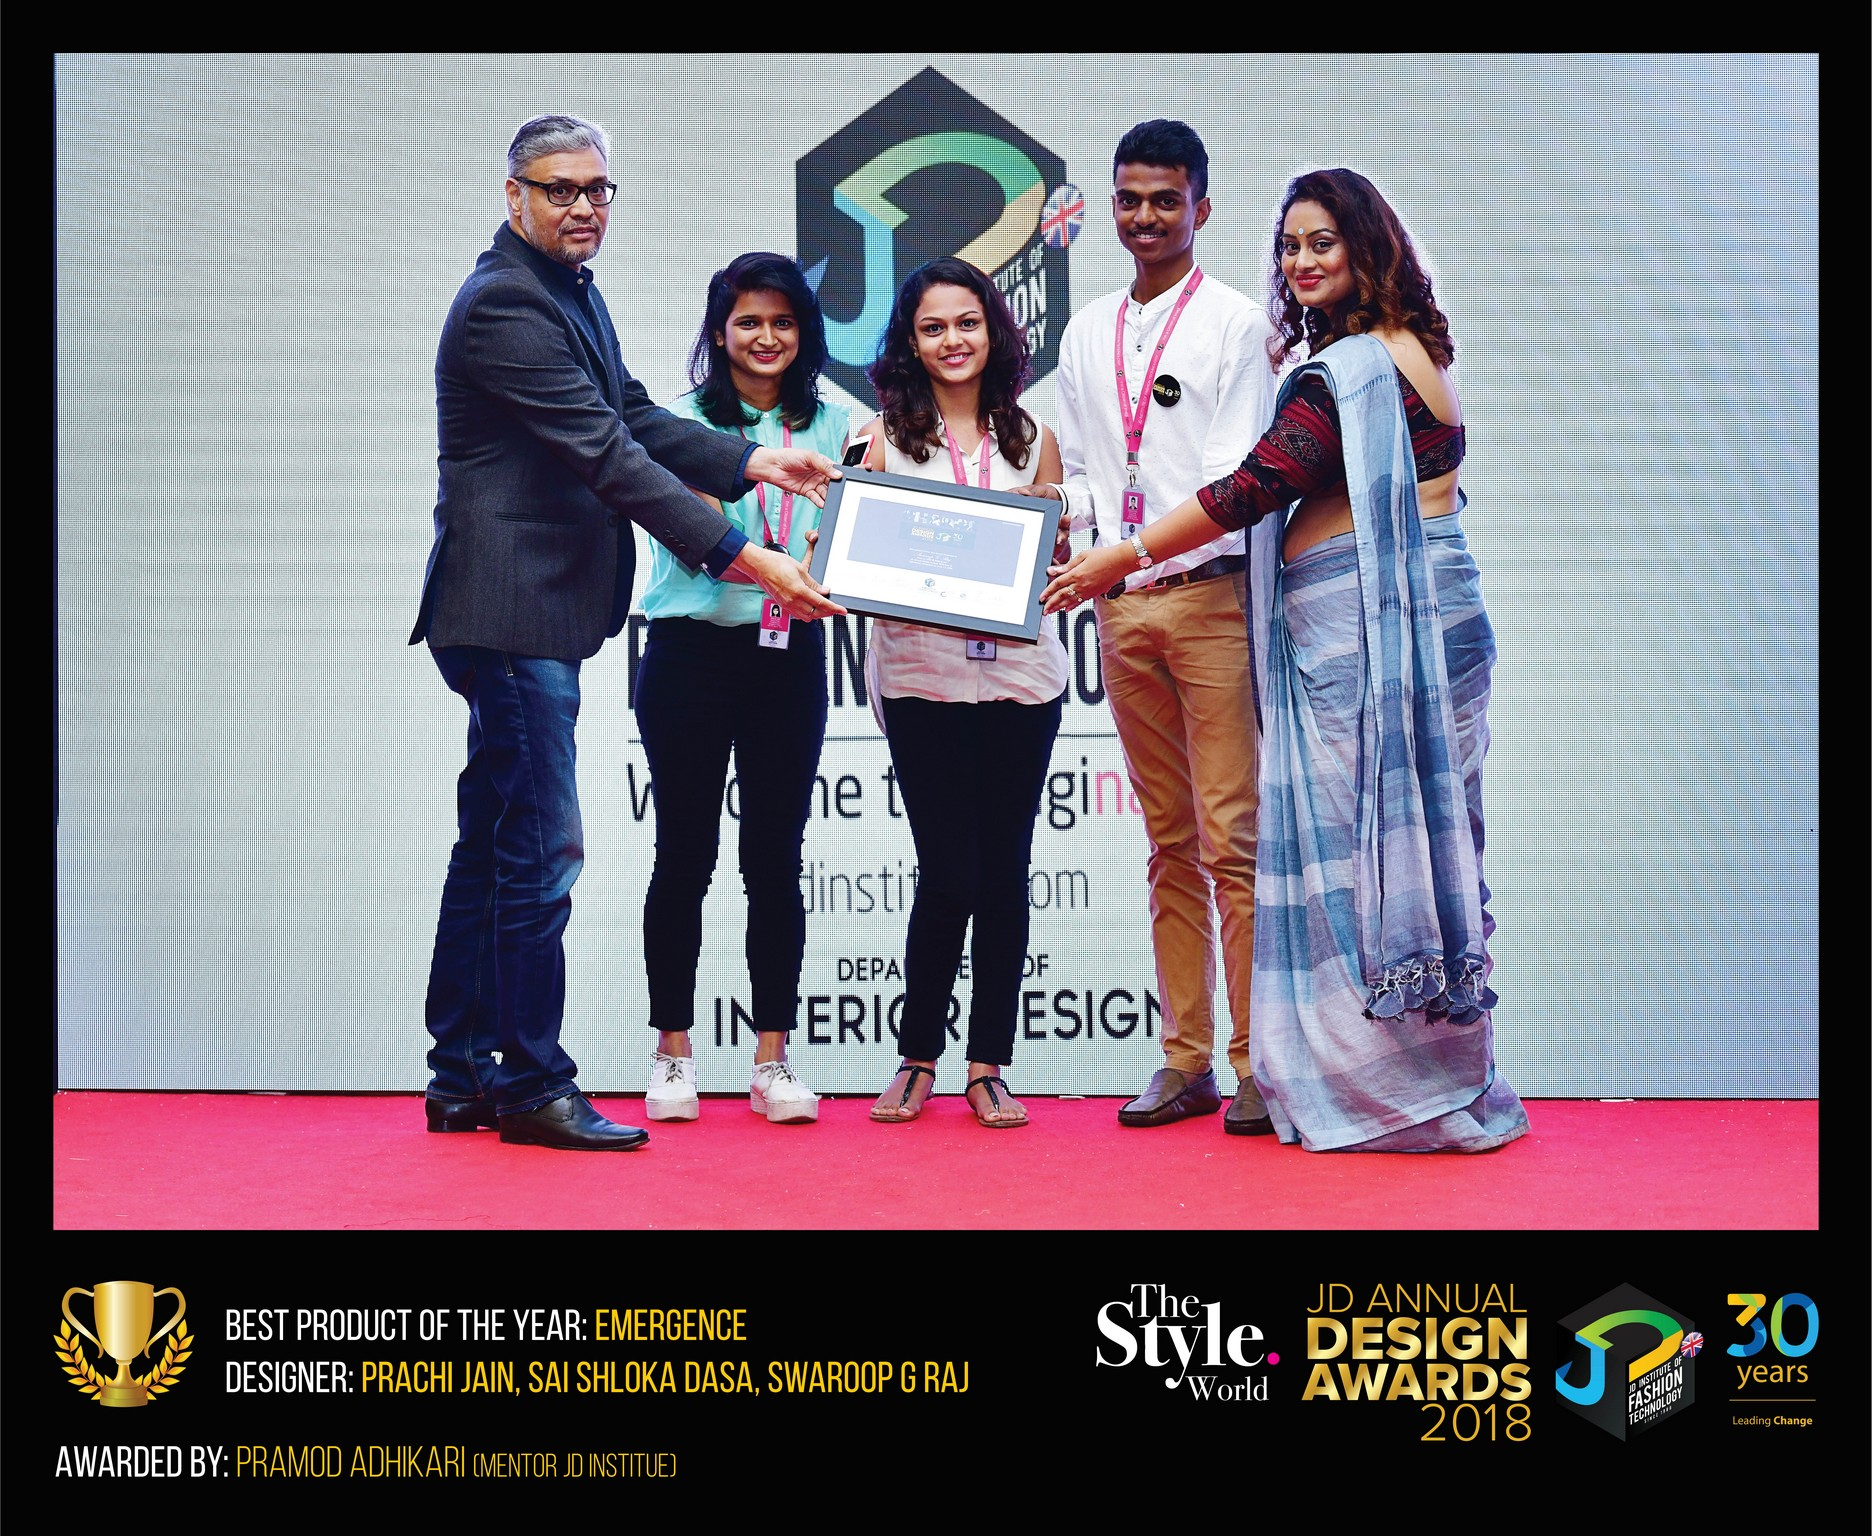 Emergence – Change – JD Annual Design Awards 2018 | Designer: Prachi Jain, Shlokha Dasa and Swaroop G Raj | Photography : Jerin Nath (@jerin_nath) emergence - emergence1 - Emergence –Change – JD Annual Design Awards 2018